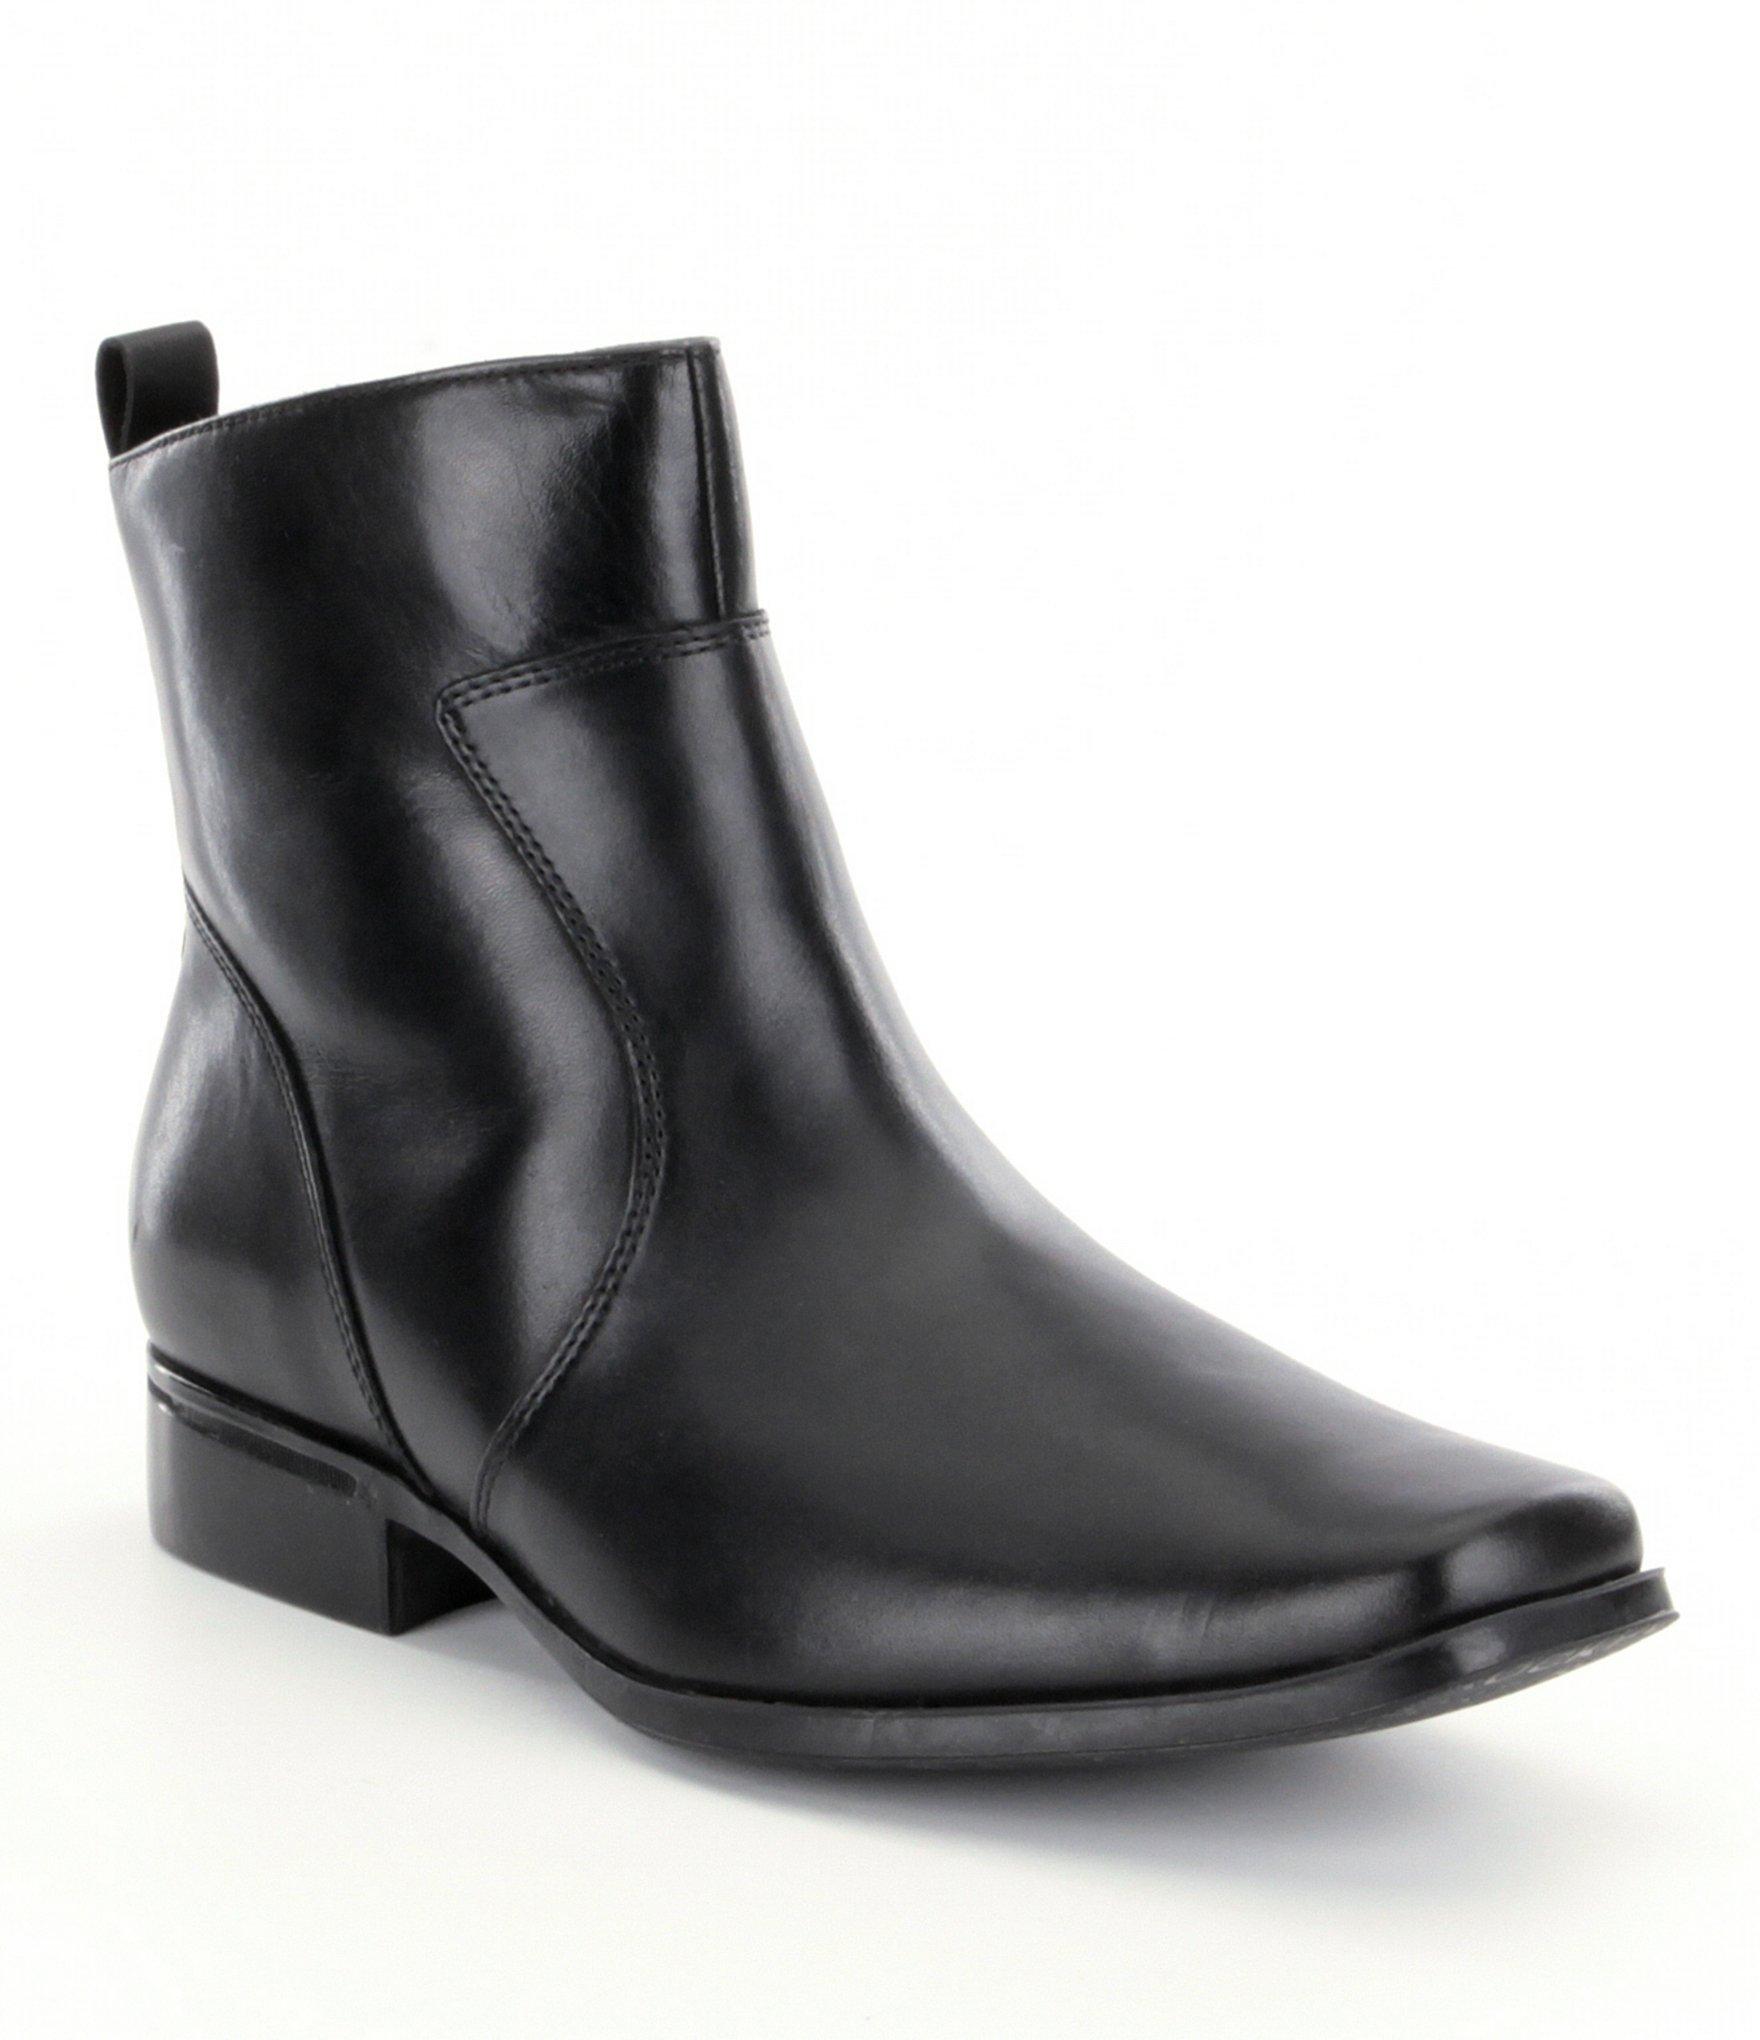 mens dress boots menu0027s dress boots   dillards mskcpbm